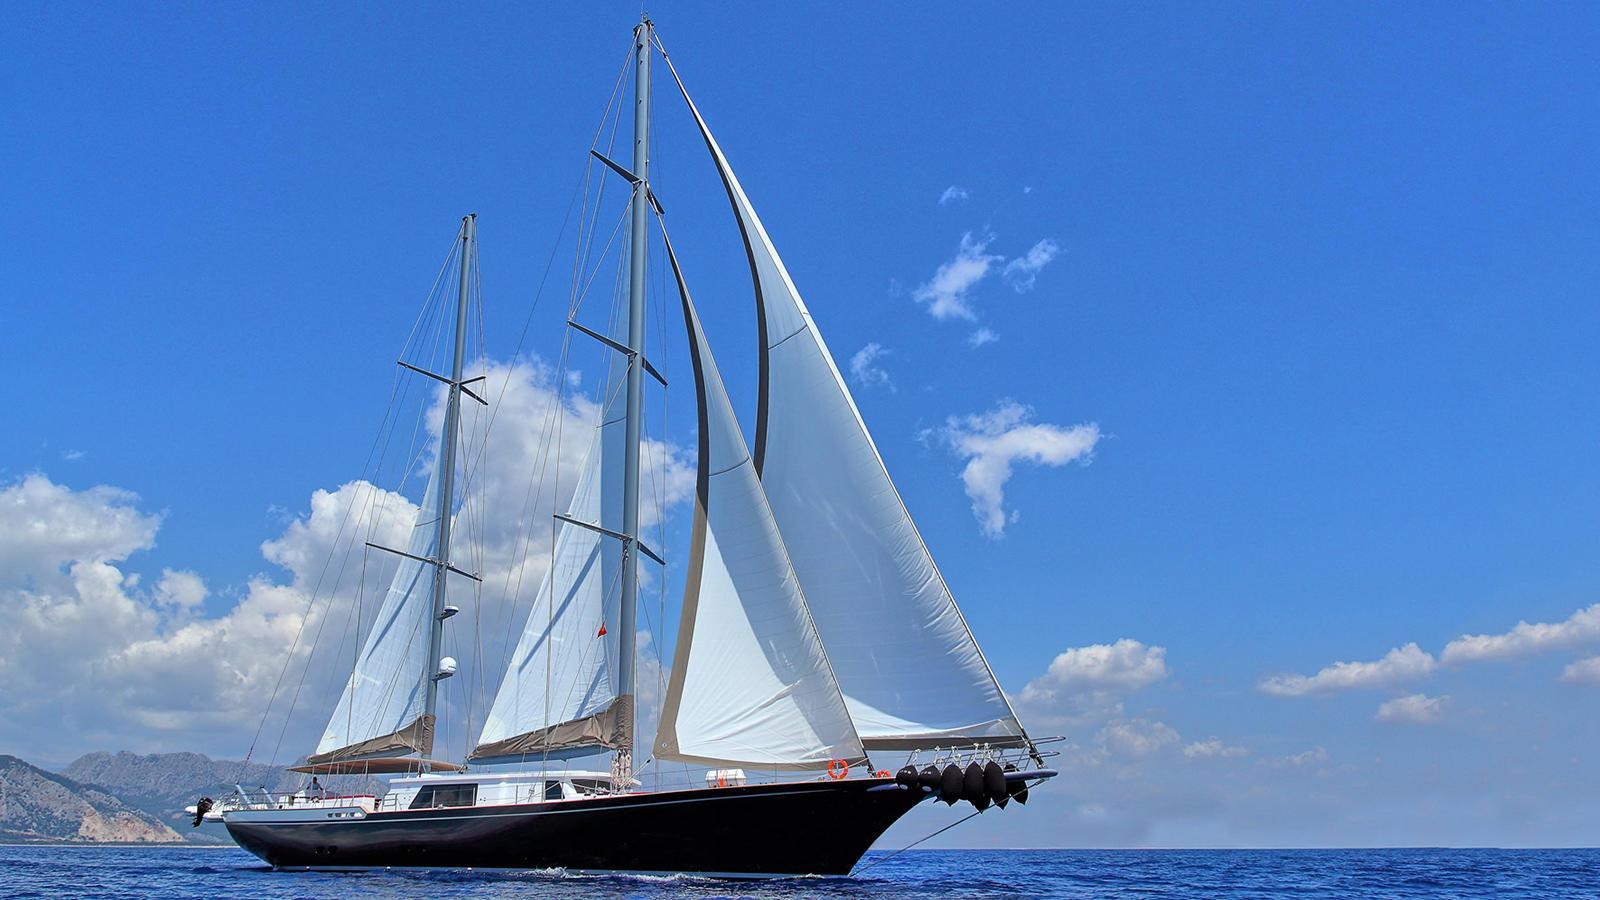 moss sailing yacht vos marine 2016 40m running profile